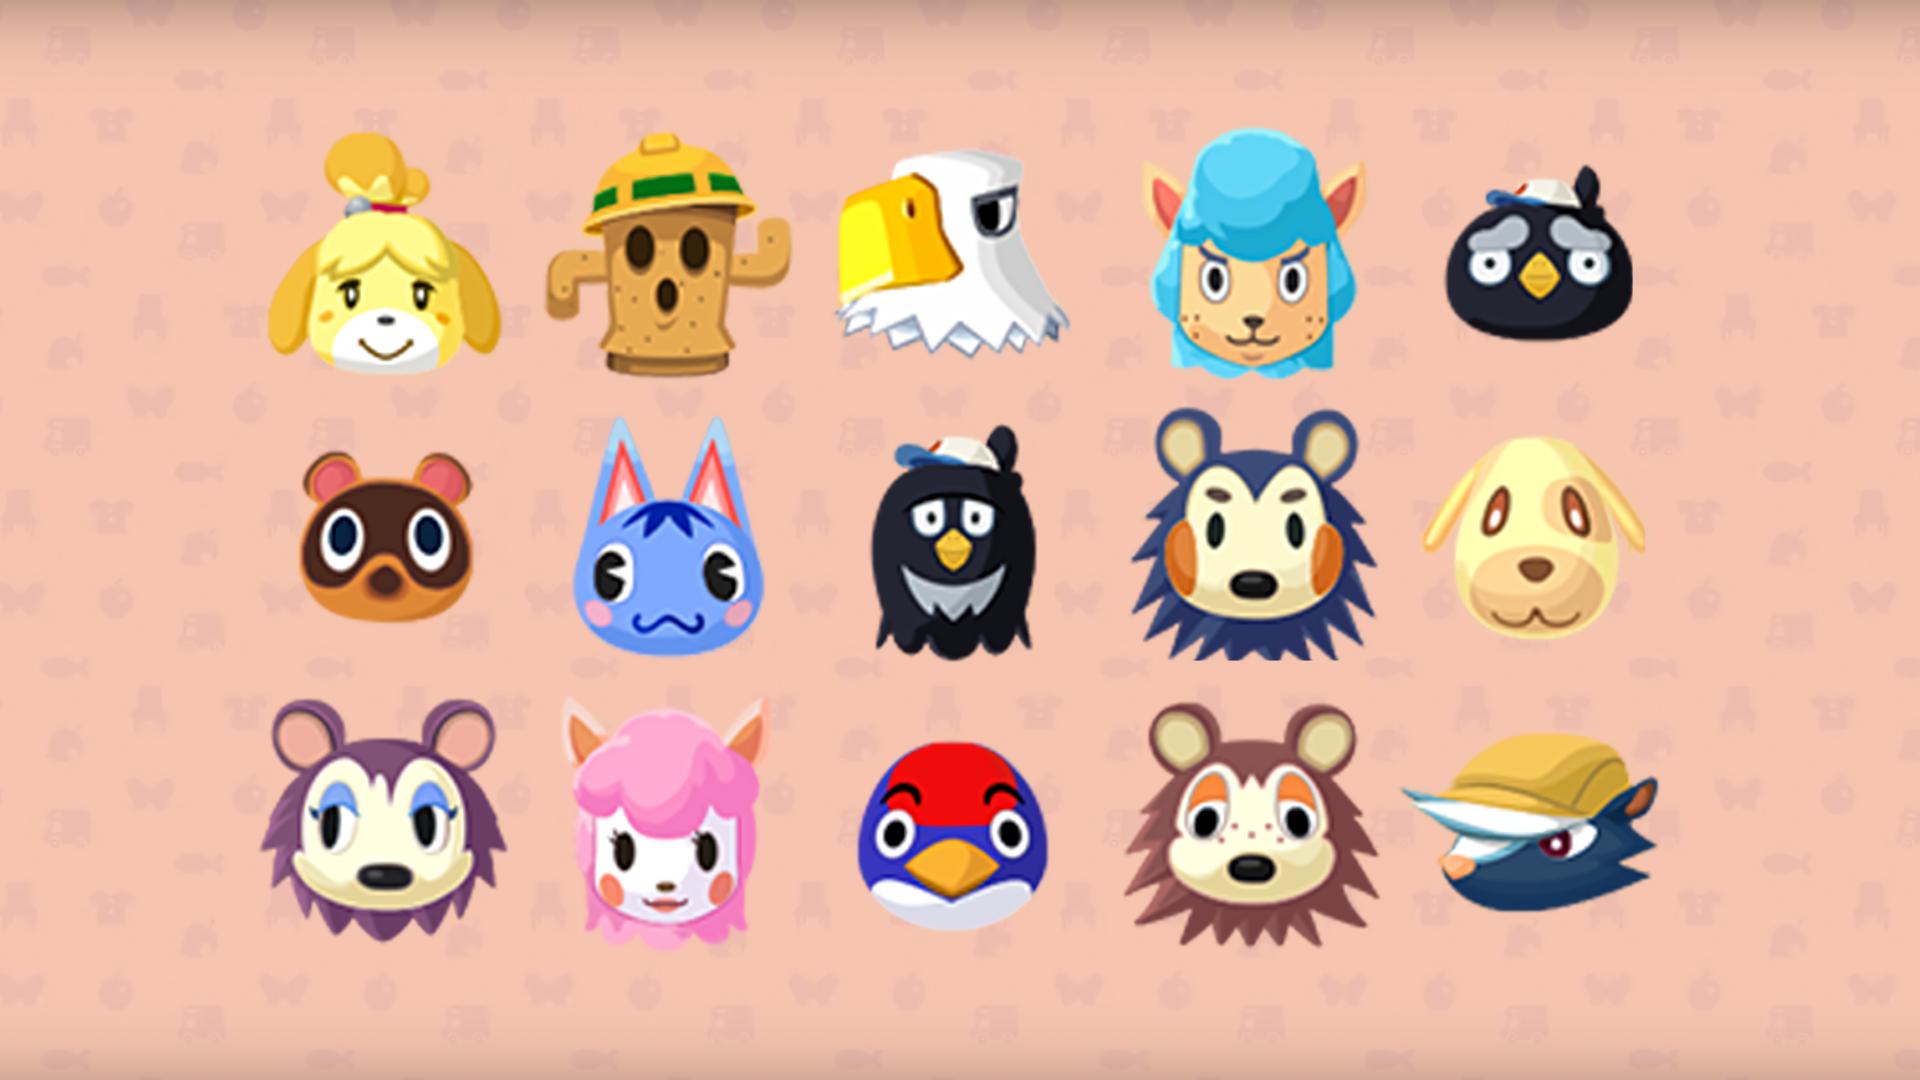 Animal Crossing Pocket Camp Hd Wallpaper Background Image